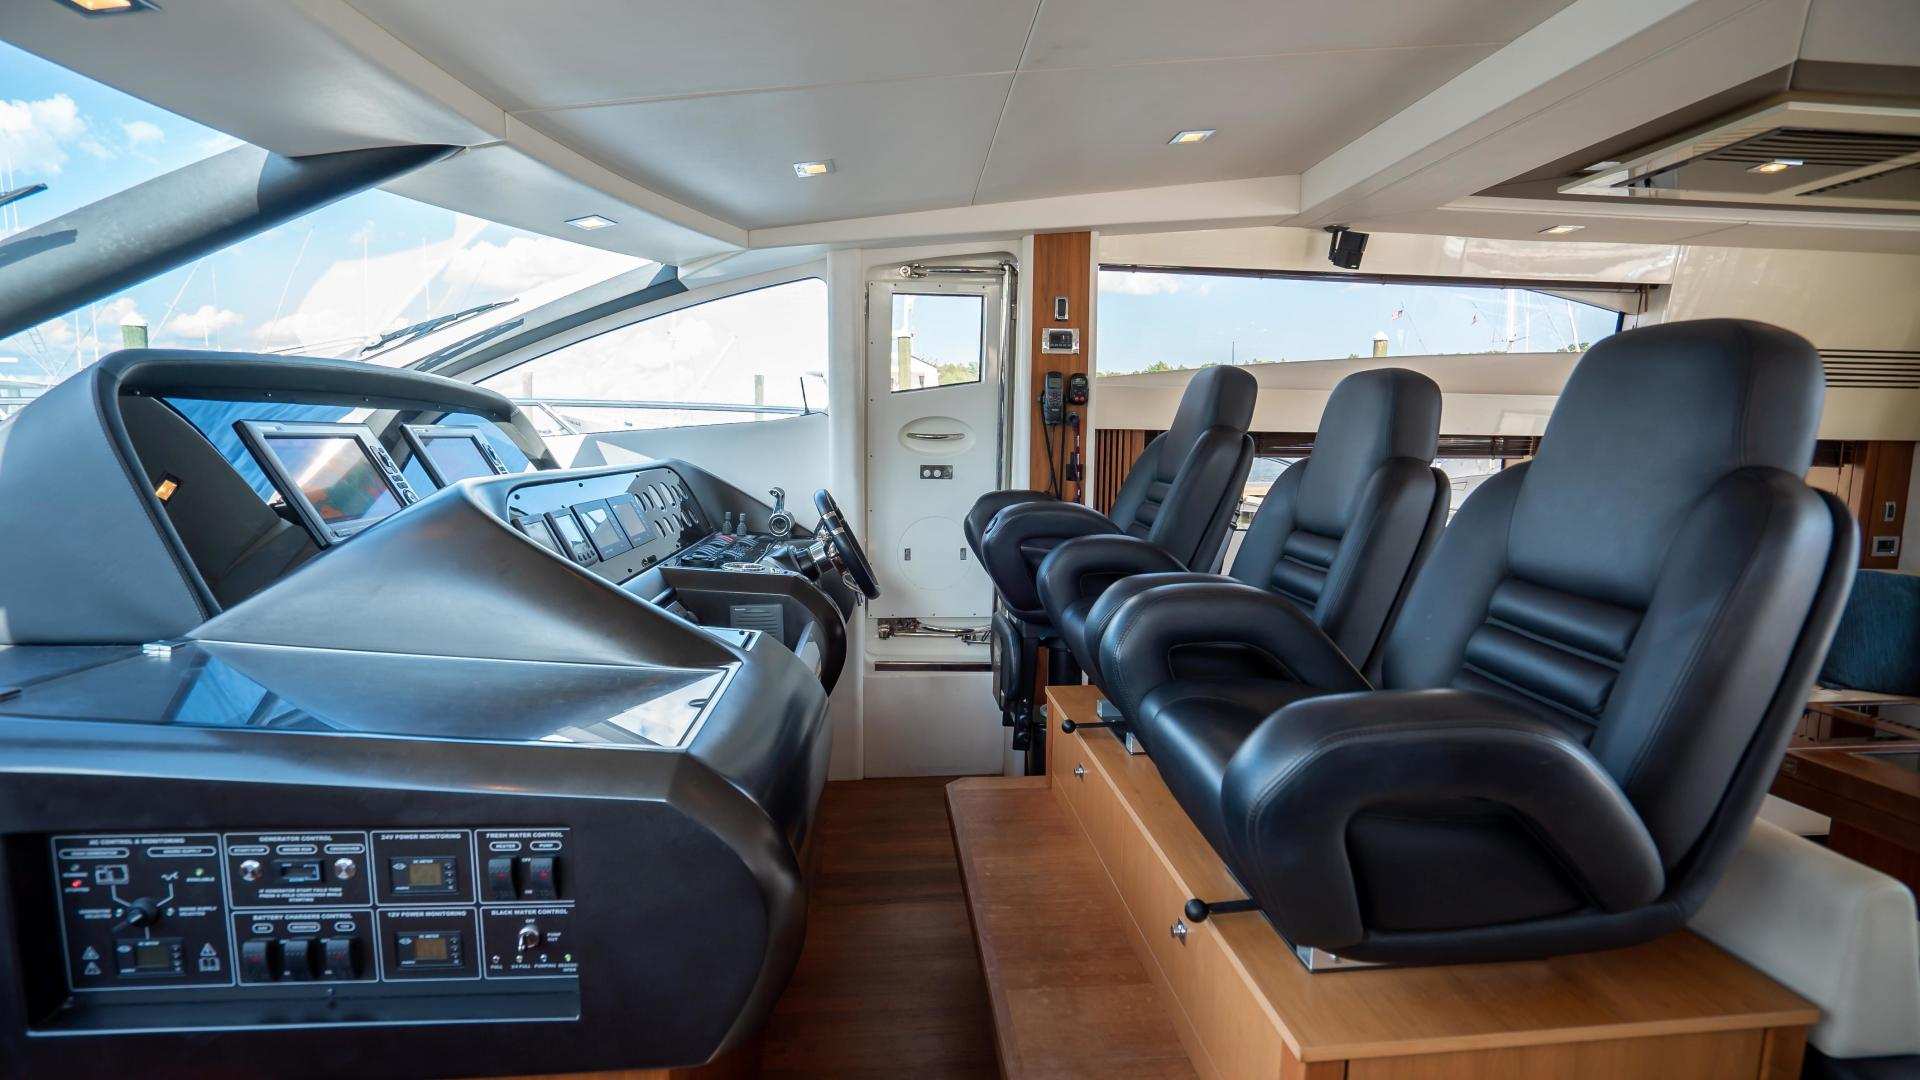 Sunseeker-Motor yacht 2012-JIMBO New Port-Rhode Island-United States-1480230   Thumbnail